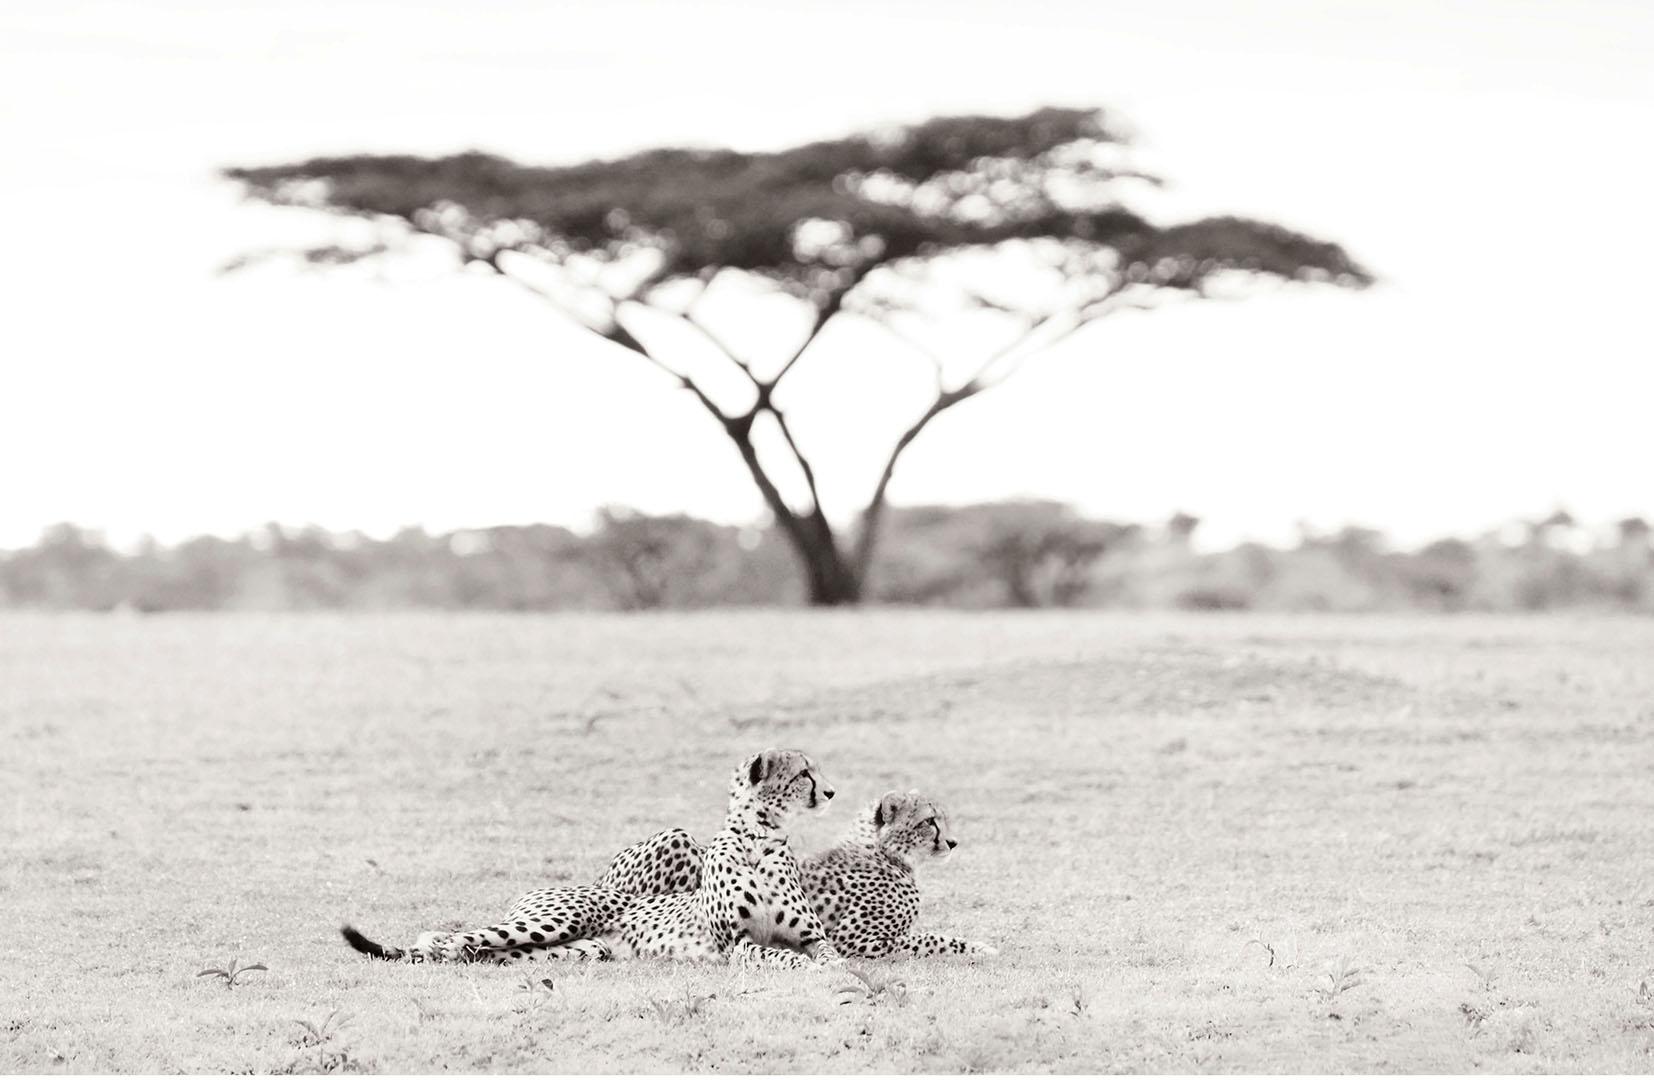 A pair of African cheetahs survey the horizon of the Serengeti Tanzania